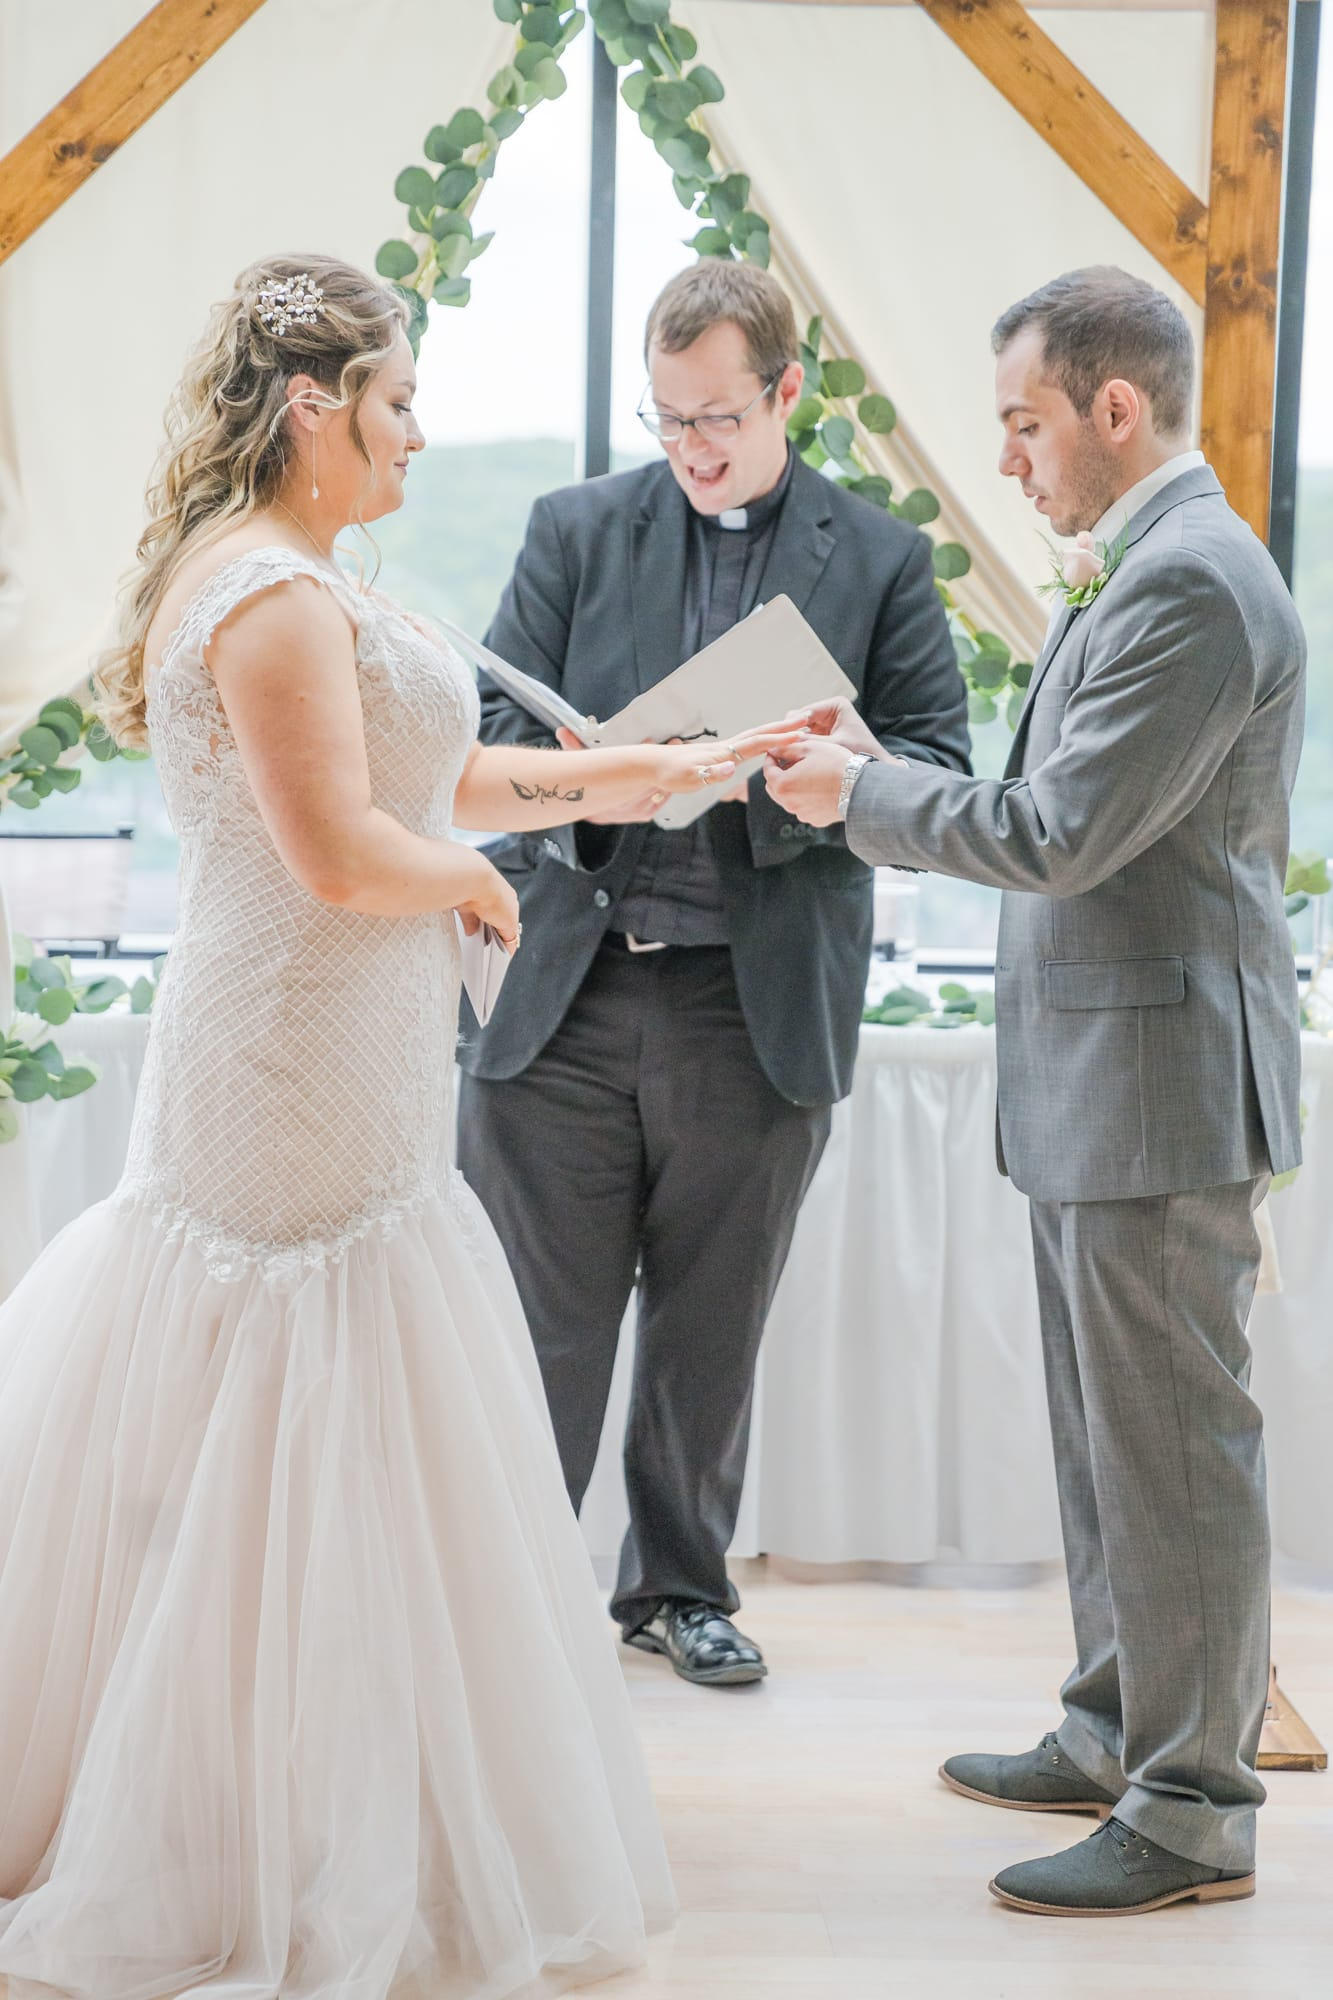 Central Pennsylvania PA summer wedding rings exchange